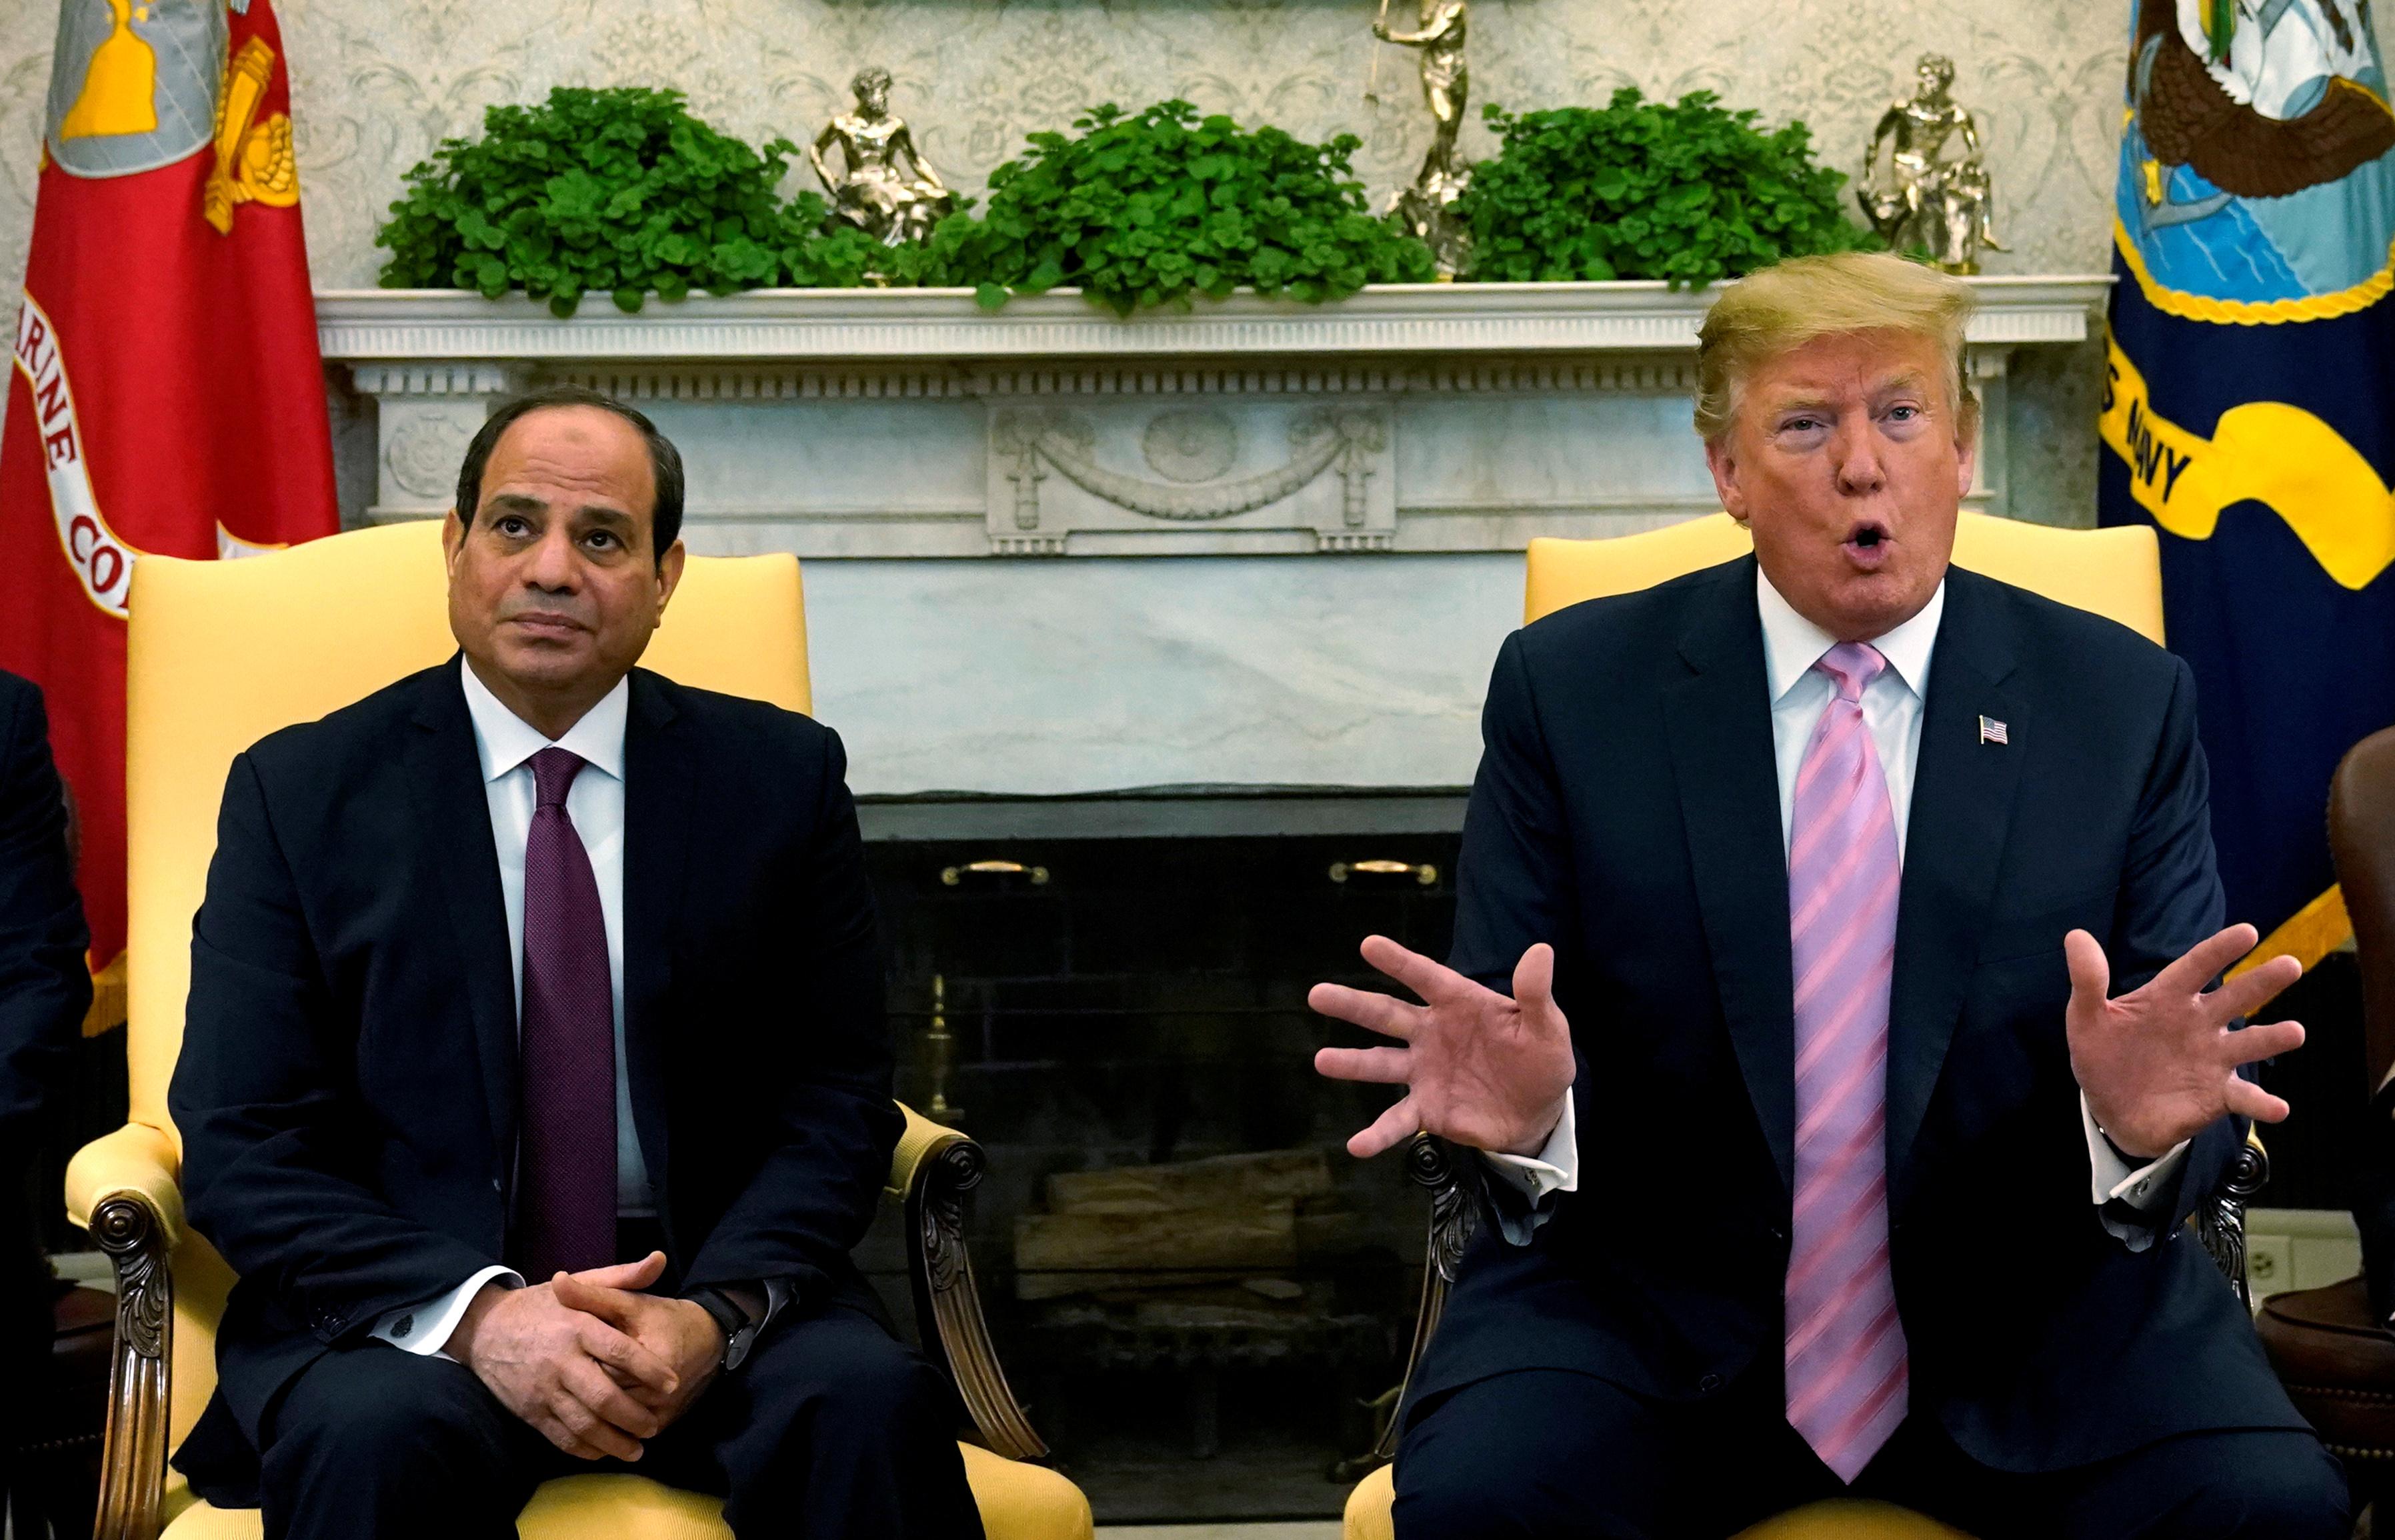 FILE PHOTO: U.S. President Donald Trump meets with Egypt President Abdel Fattah al-Sisi at the White House in Washington, U.S., April 9, 2019.   REUTERS/Kevin Lamarque/File Photo